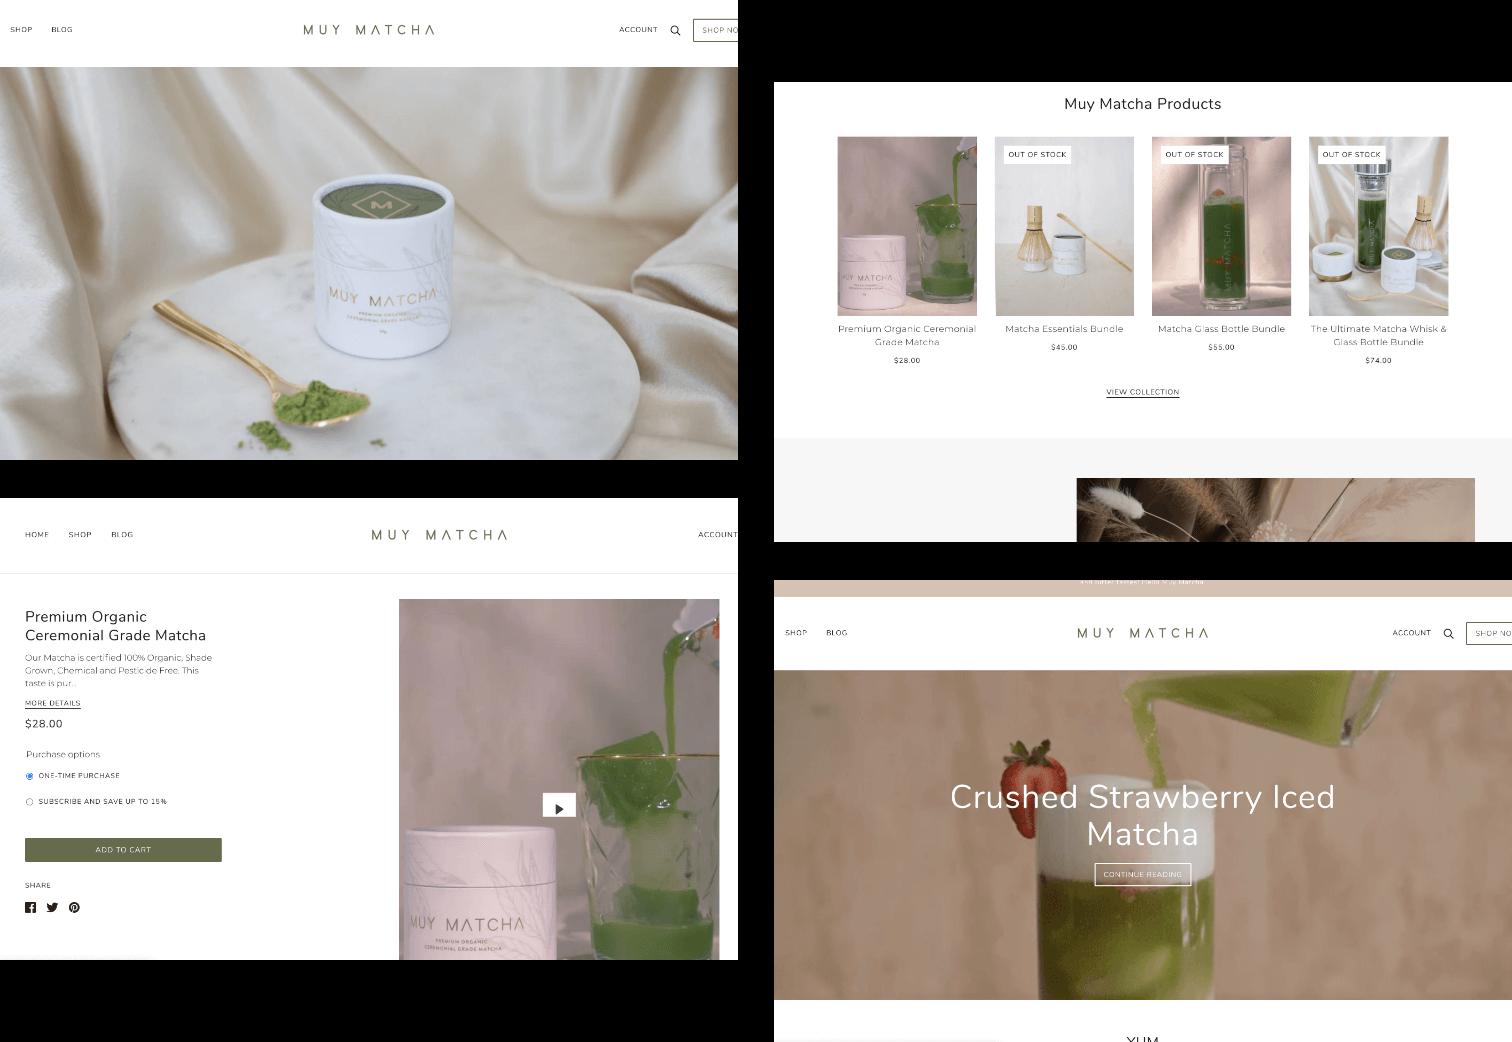 screenshot showing the muy matcha website